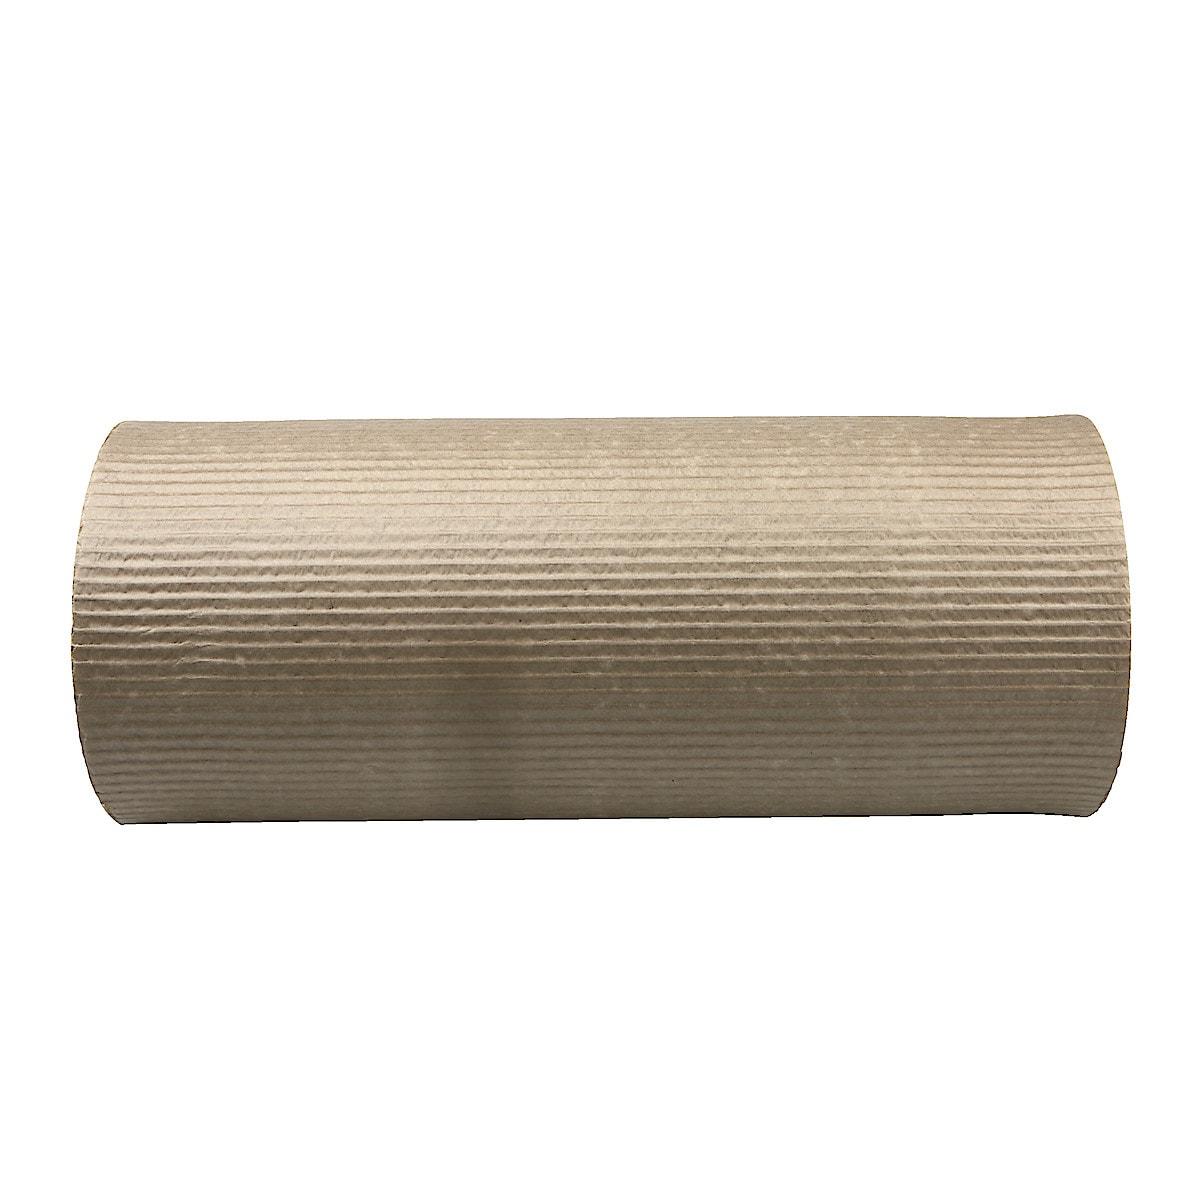 Wellpapp 40 cm x 10 m